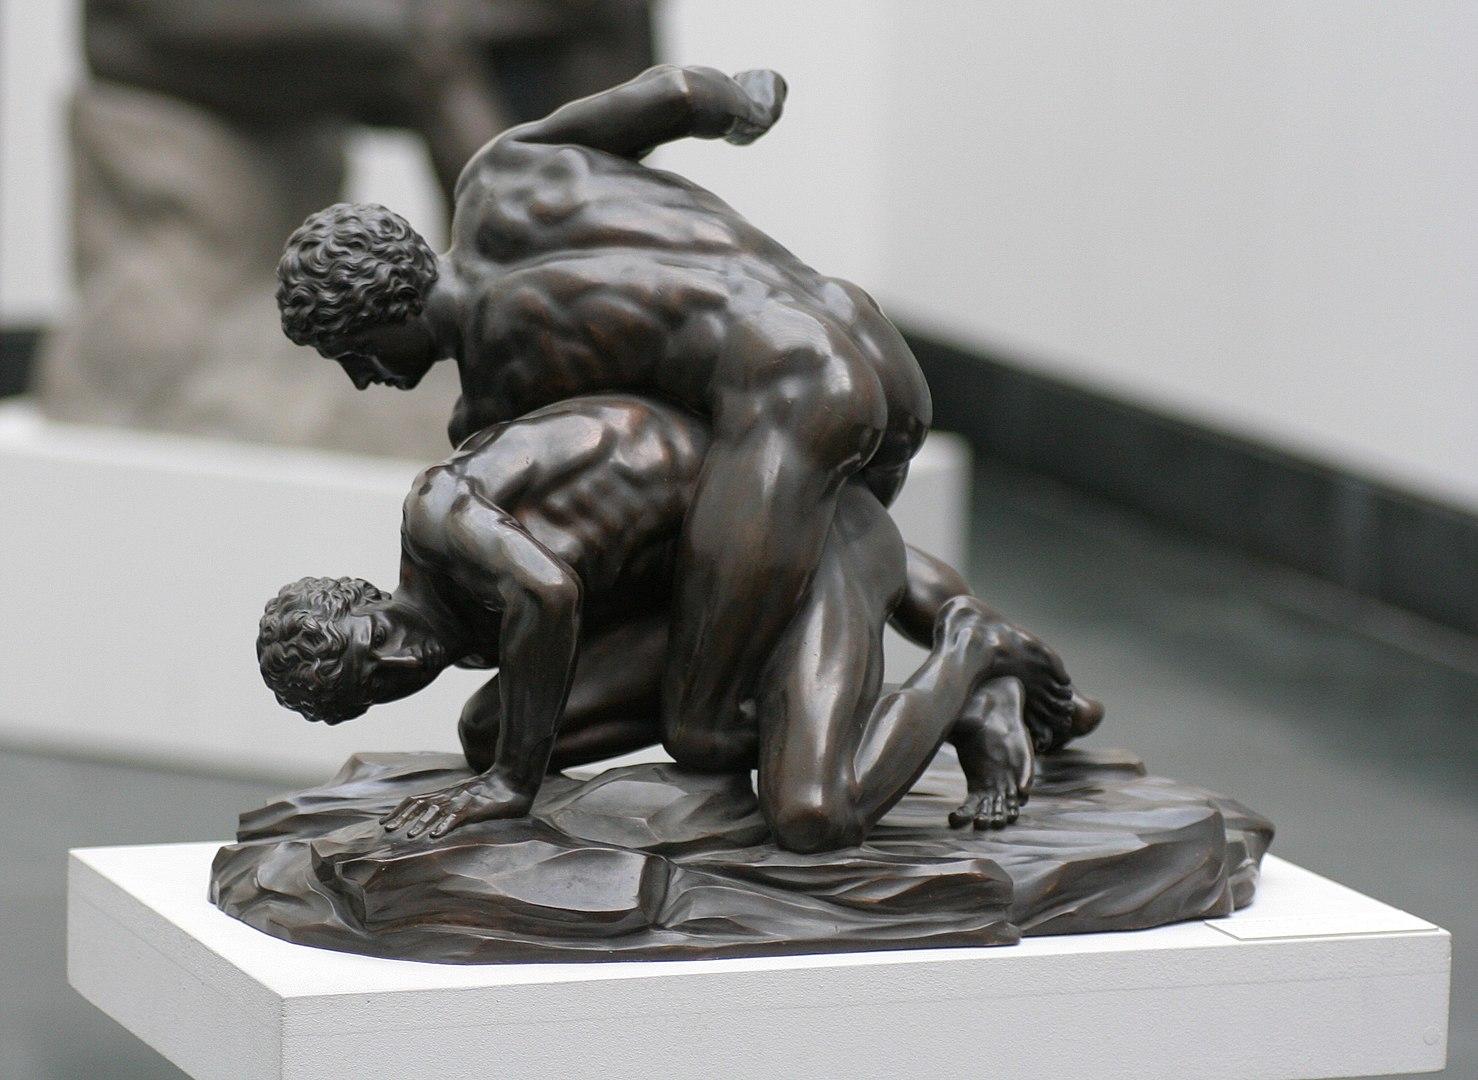 1478px-Pankratiasten_in_fight_copy_of_greek_statue_3_century_bC